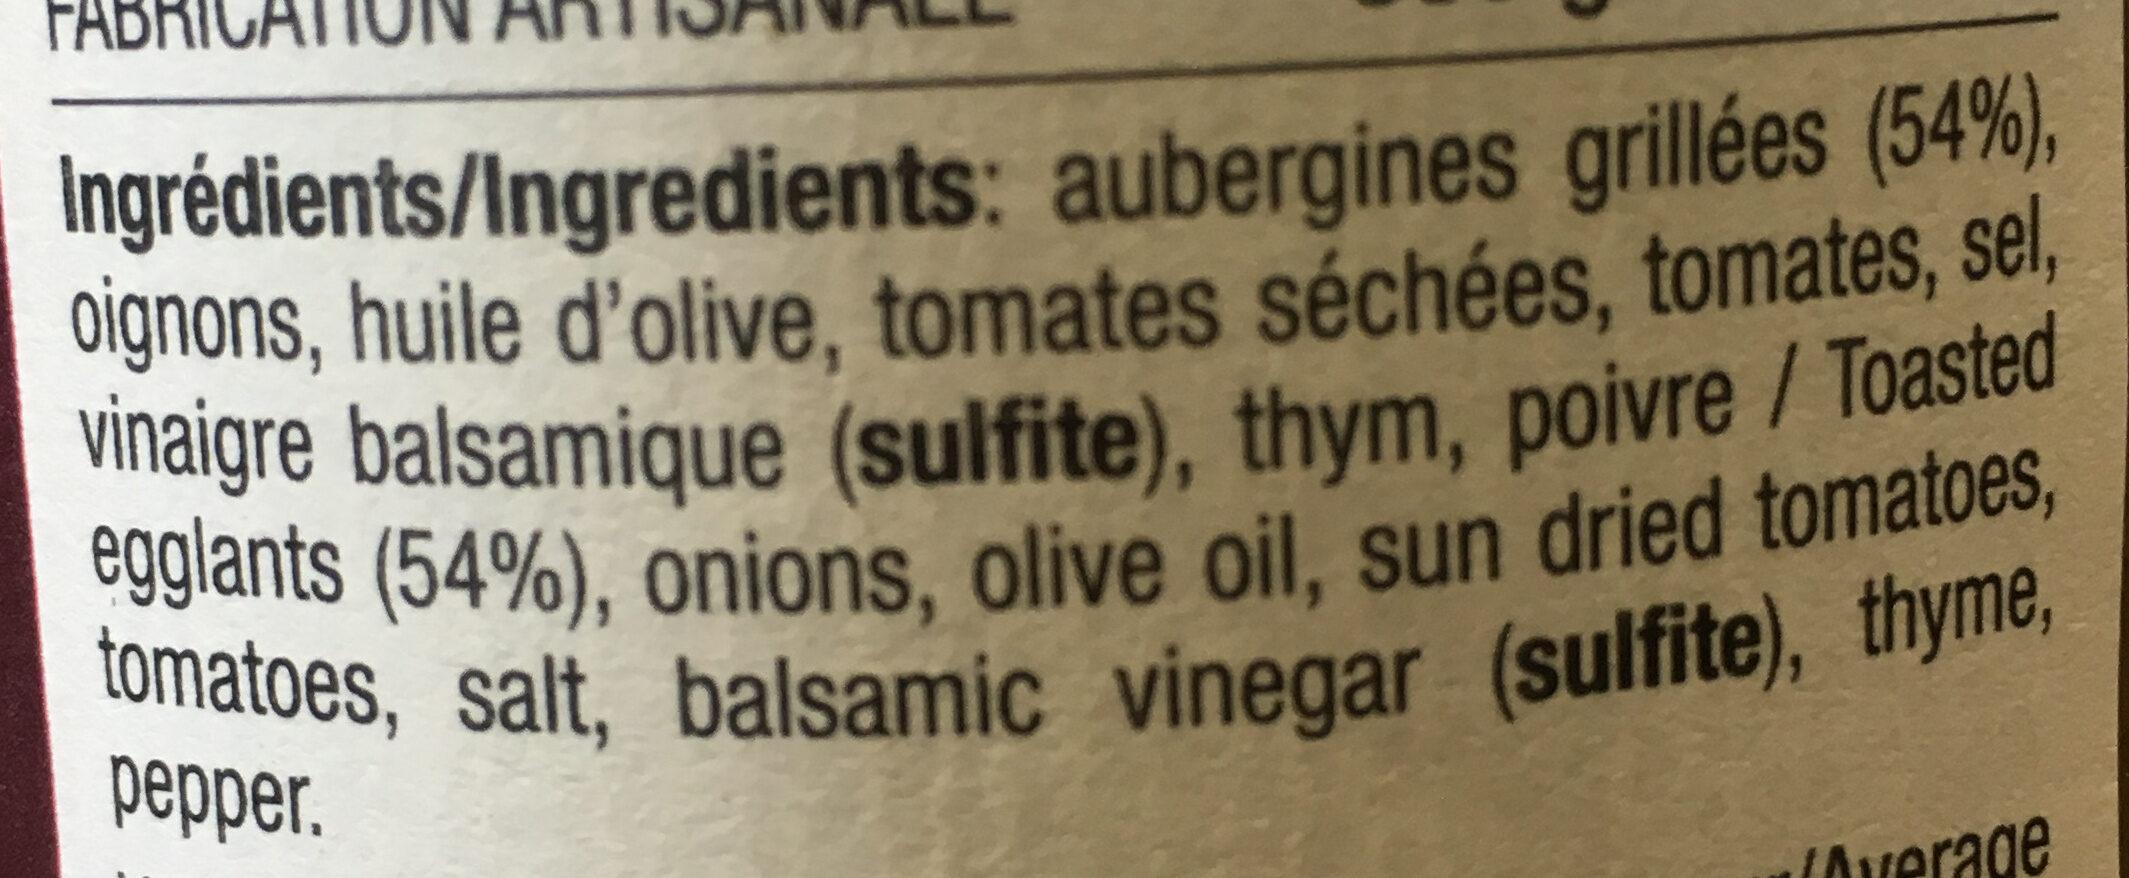 Riste d'aubergines grillées - Ingredients